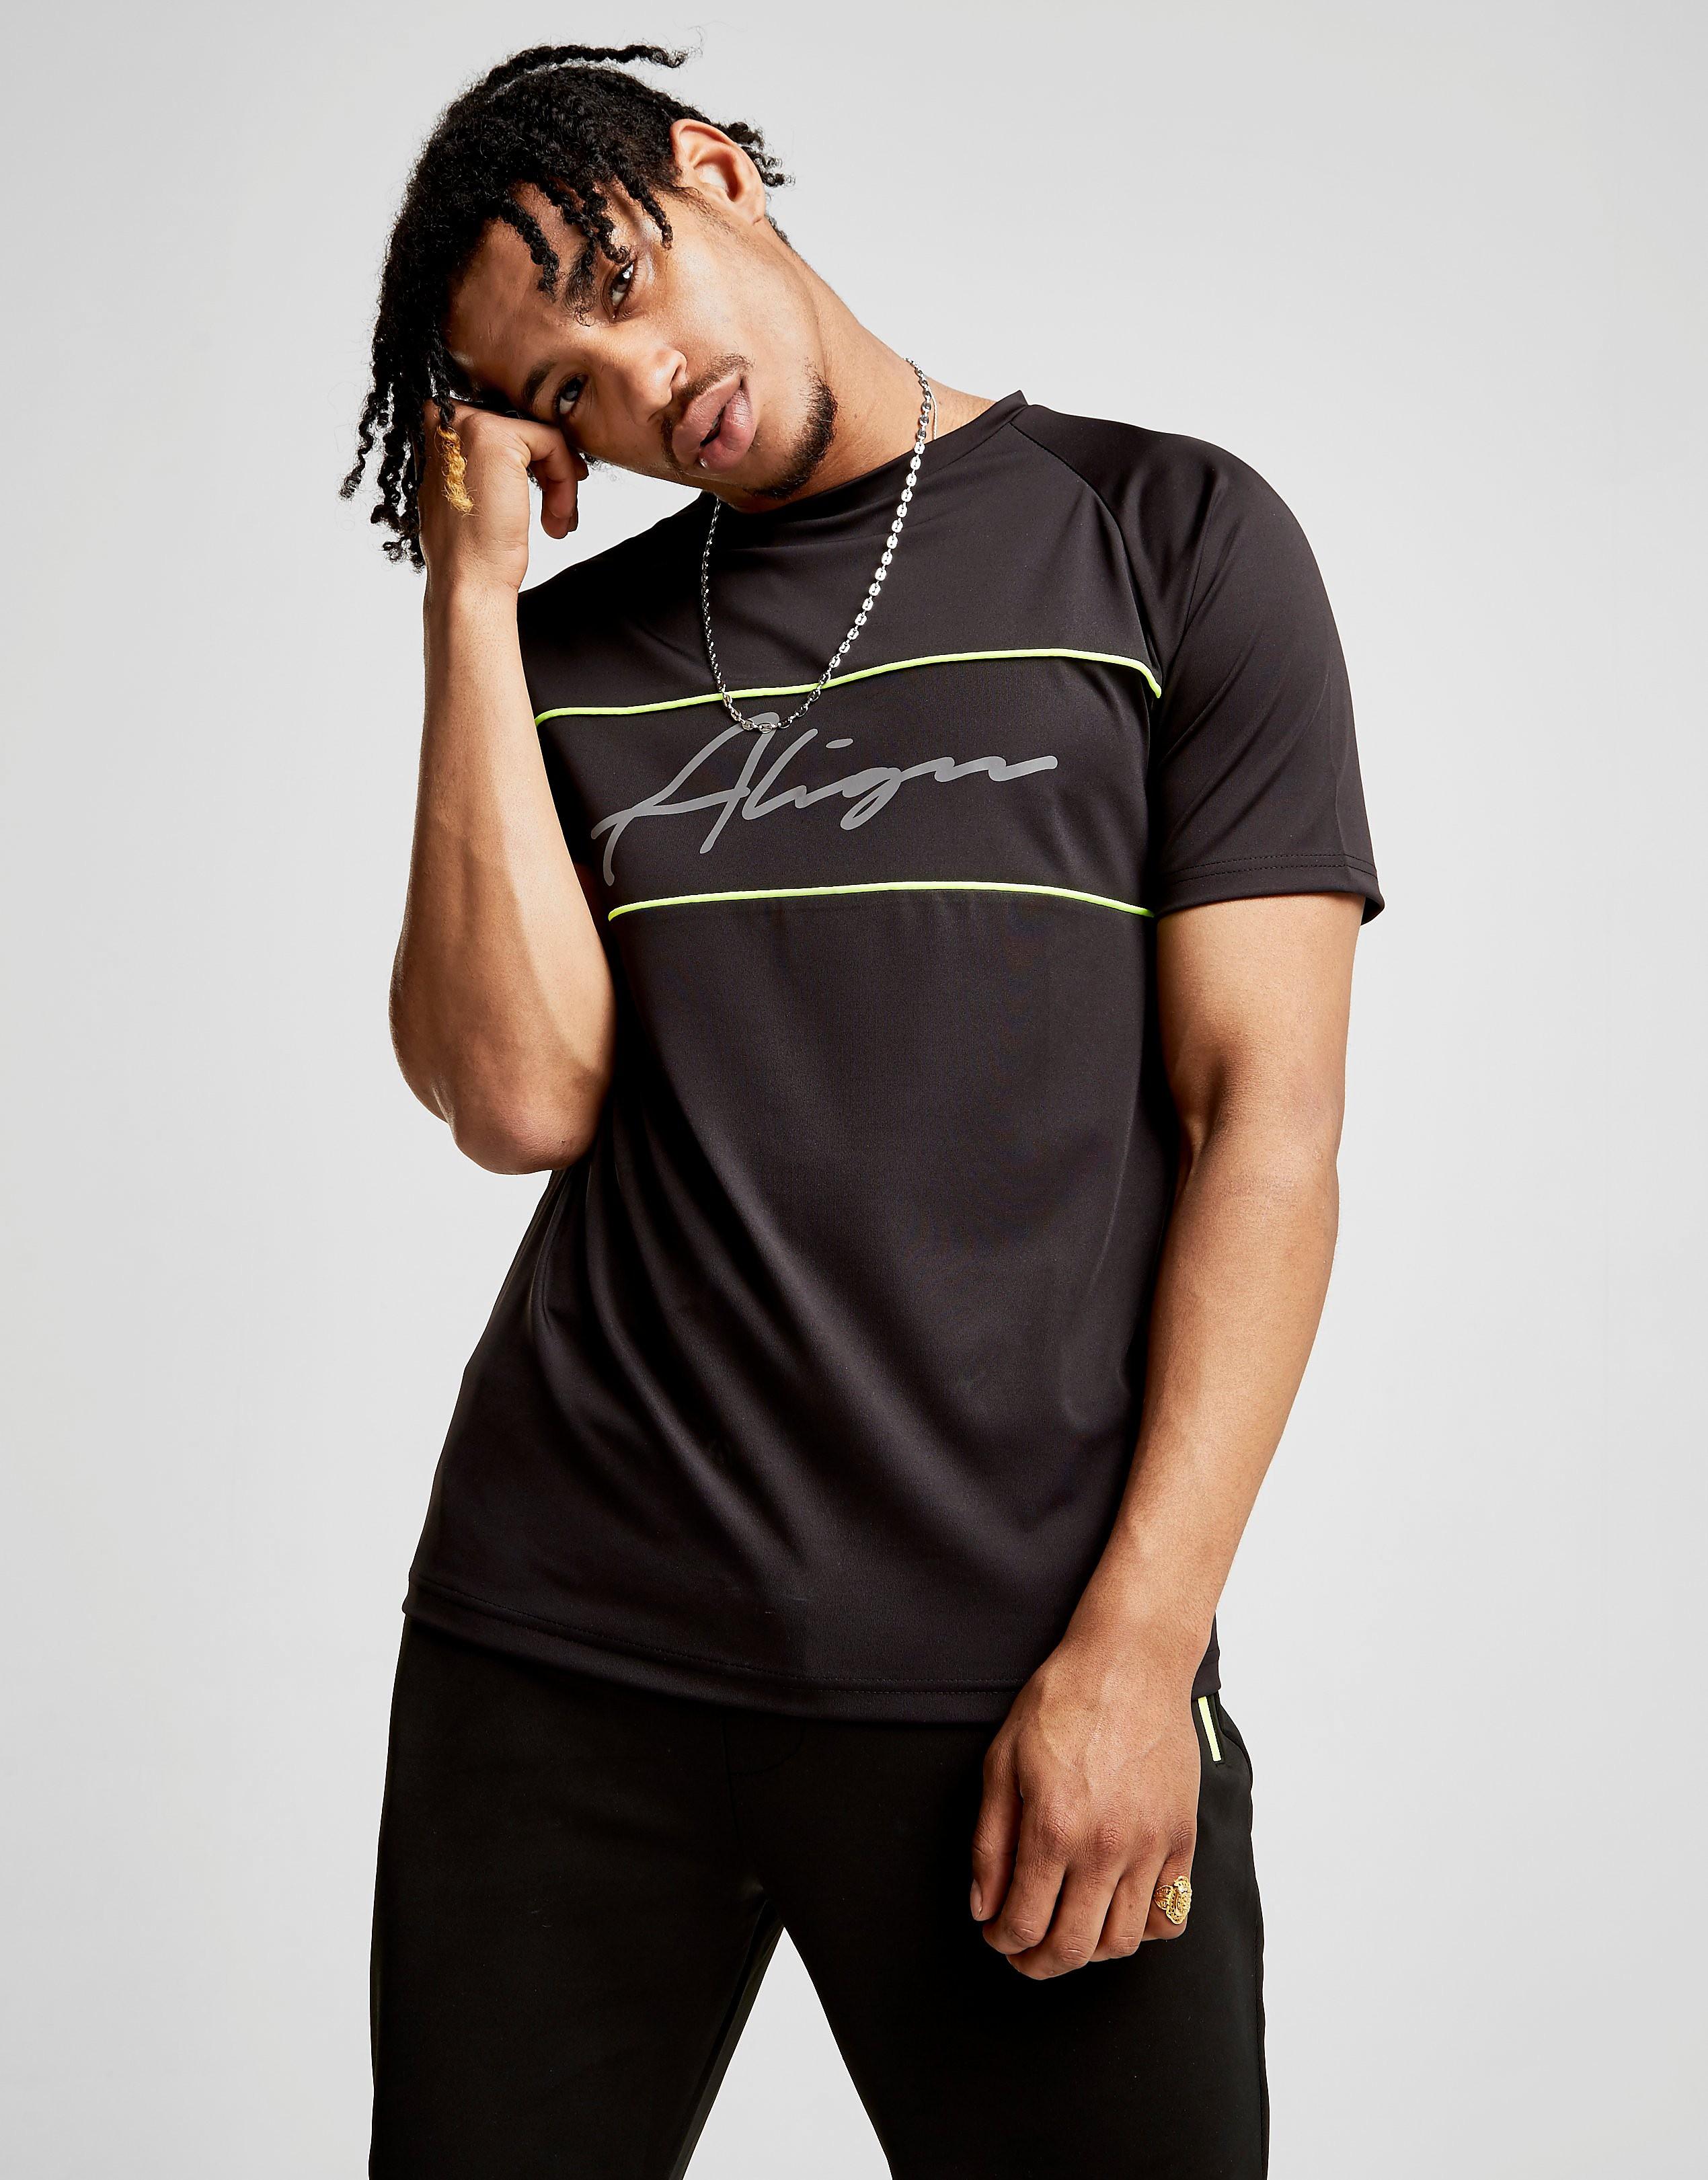 Align Signature Poly T-Shirt